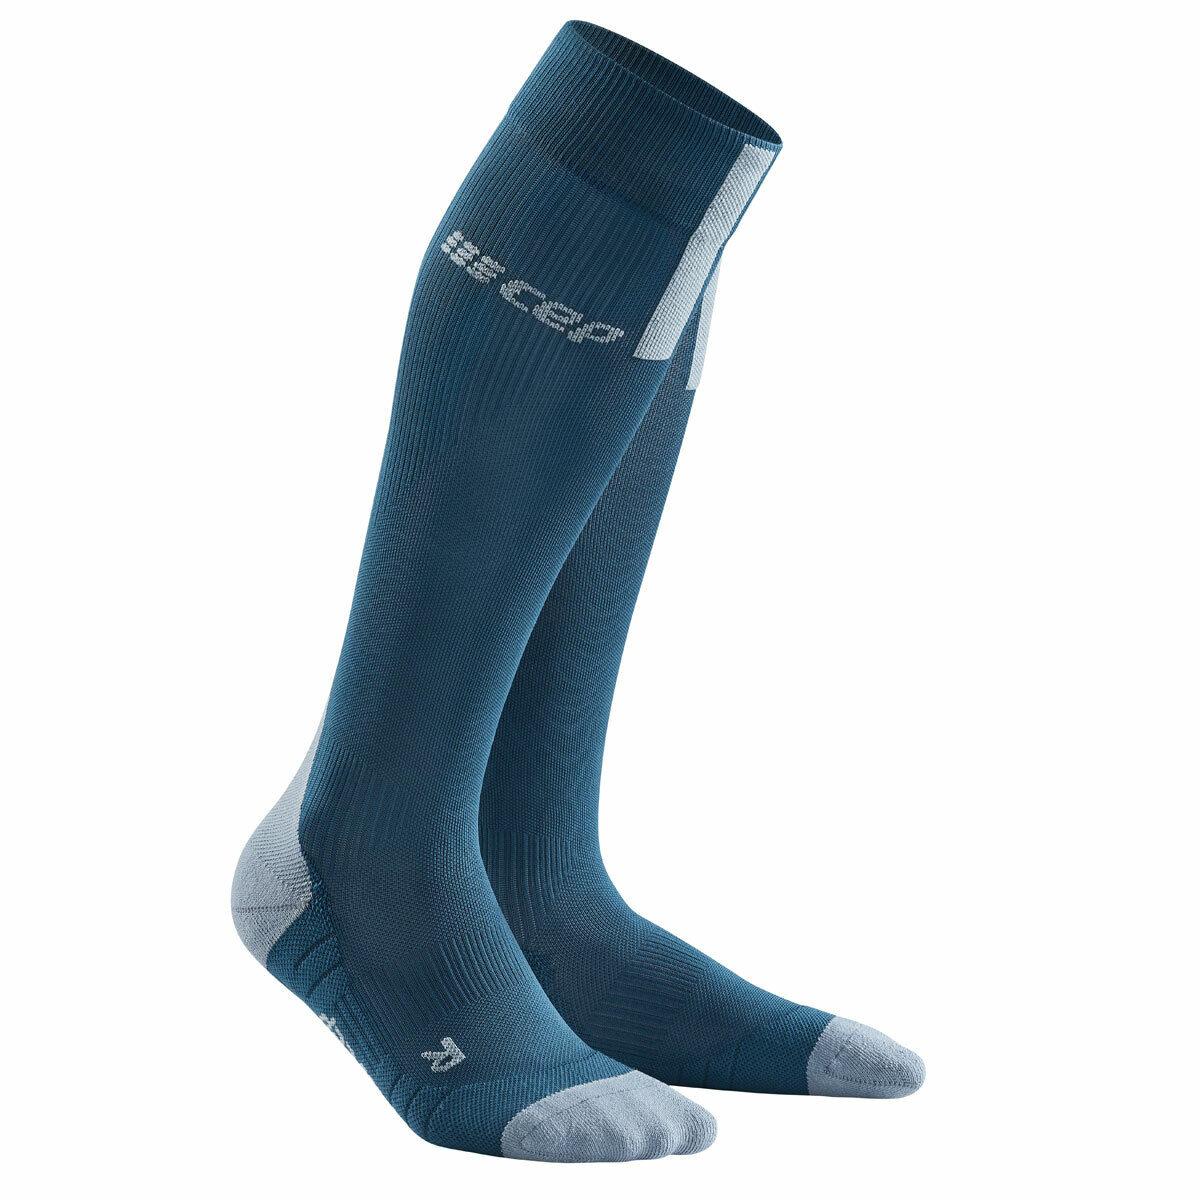 Cep run compression socks 3.0 Men azul gris   wp50dx   compresión